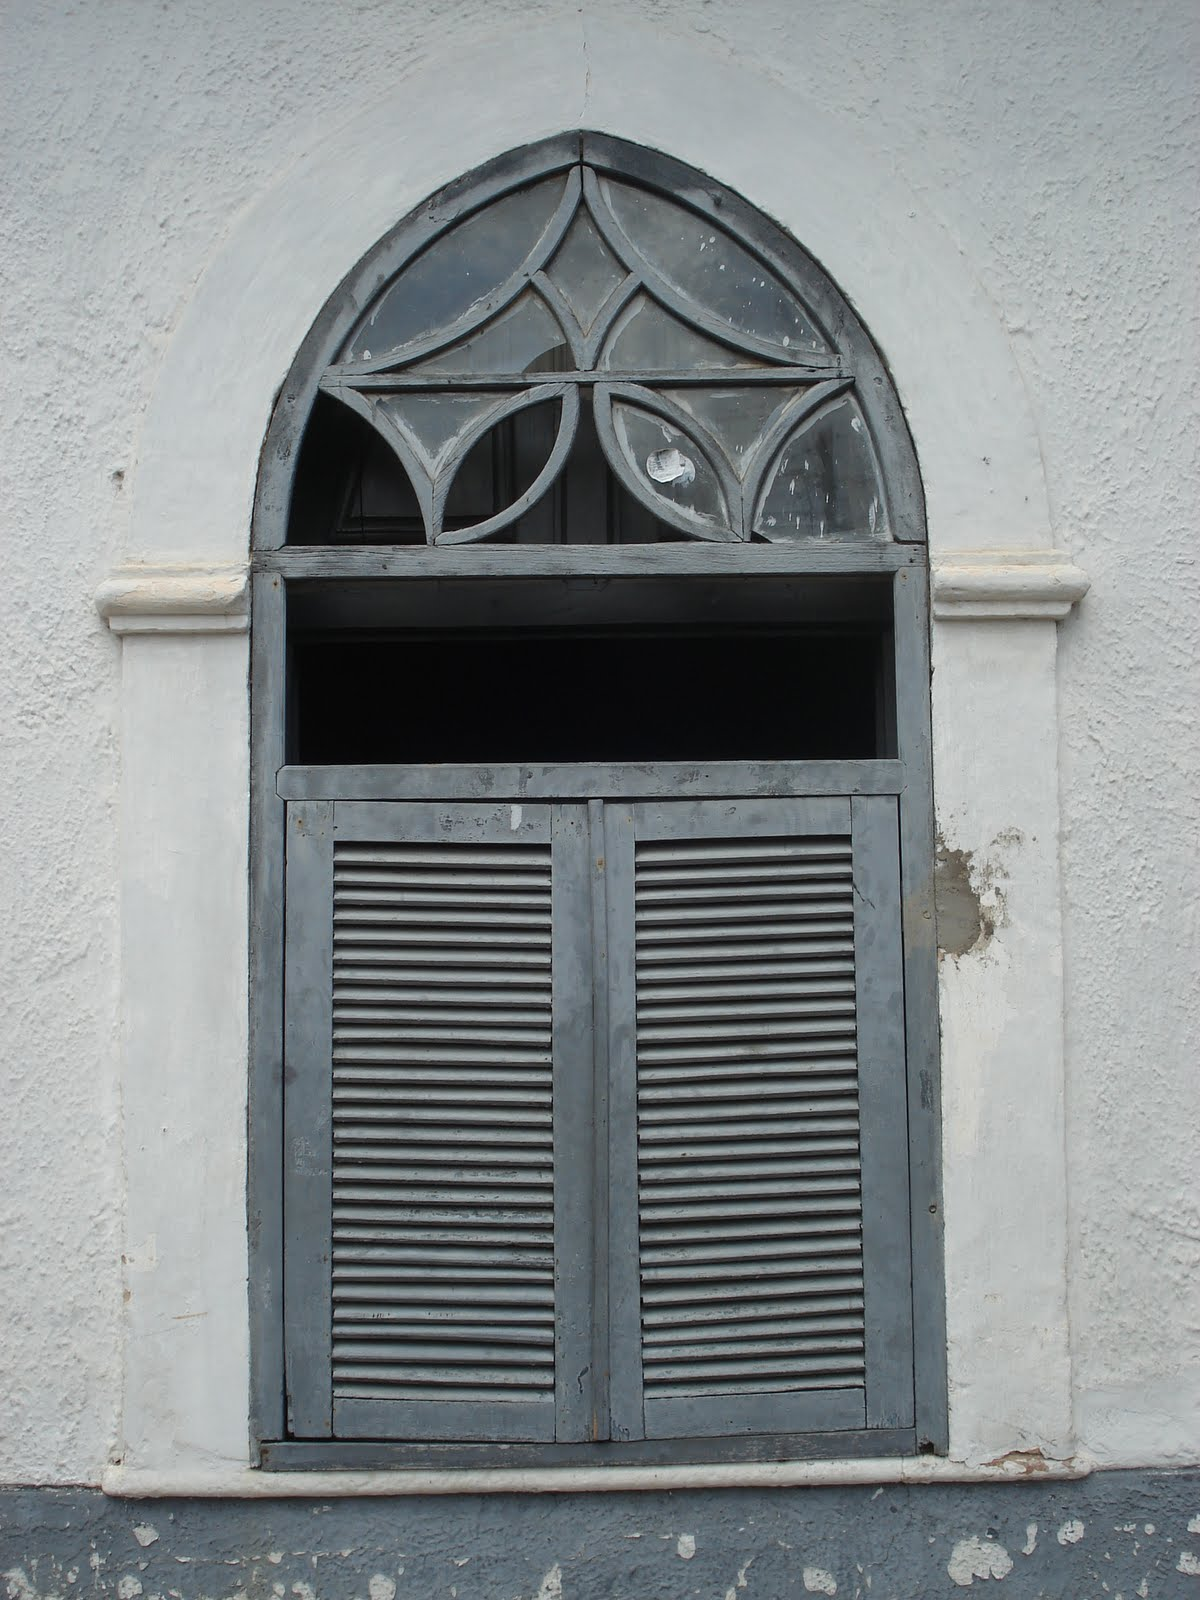 #515B61 KAKI AFONSO Arquitetura: Janelas da arquitetura piauiense: Amarante. 474 Janelas Duplas Madeira